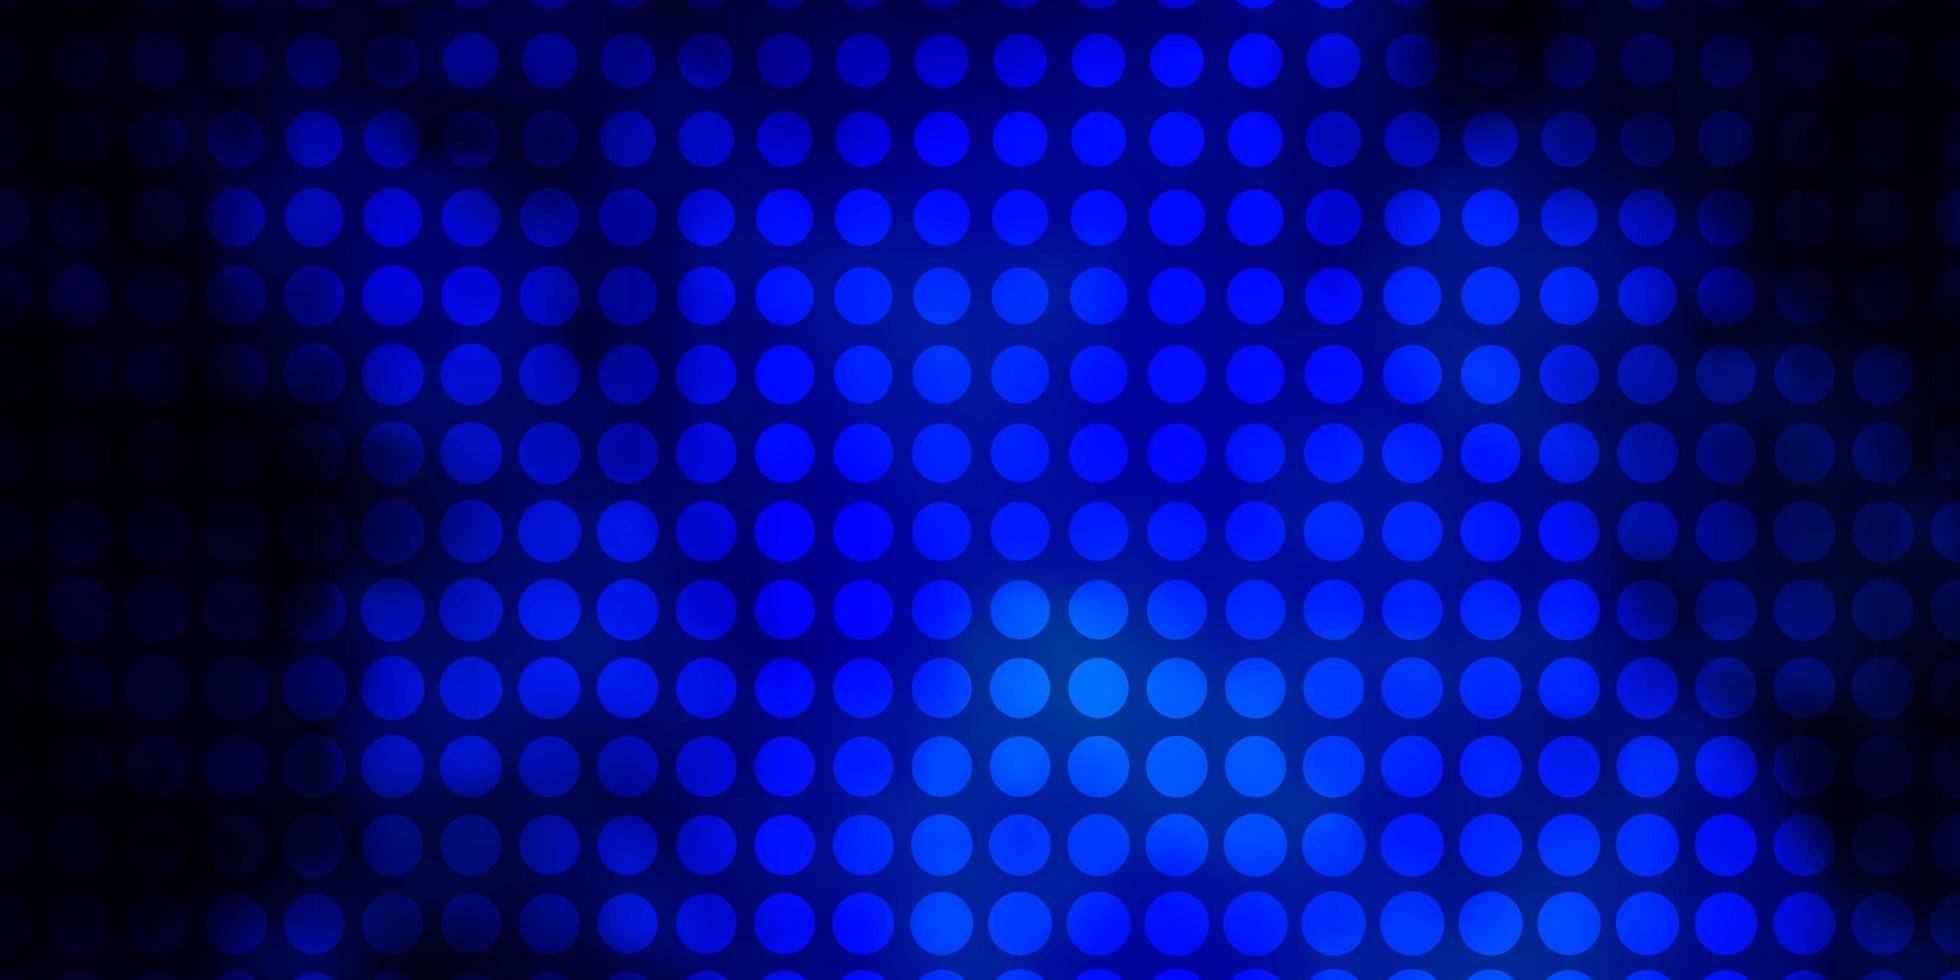 modelo de vetor azul escuro com círculos